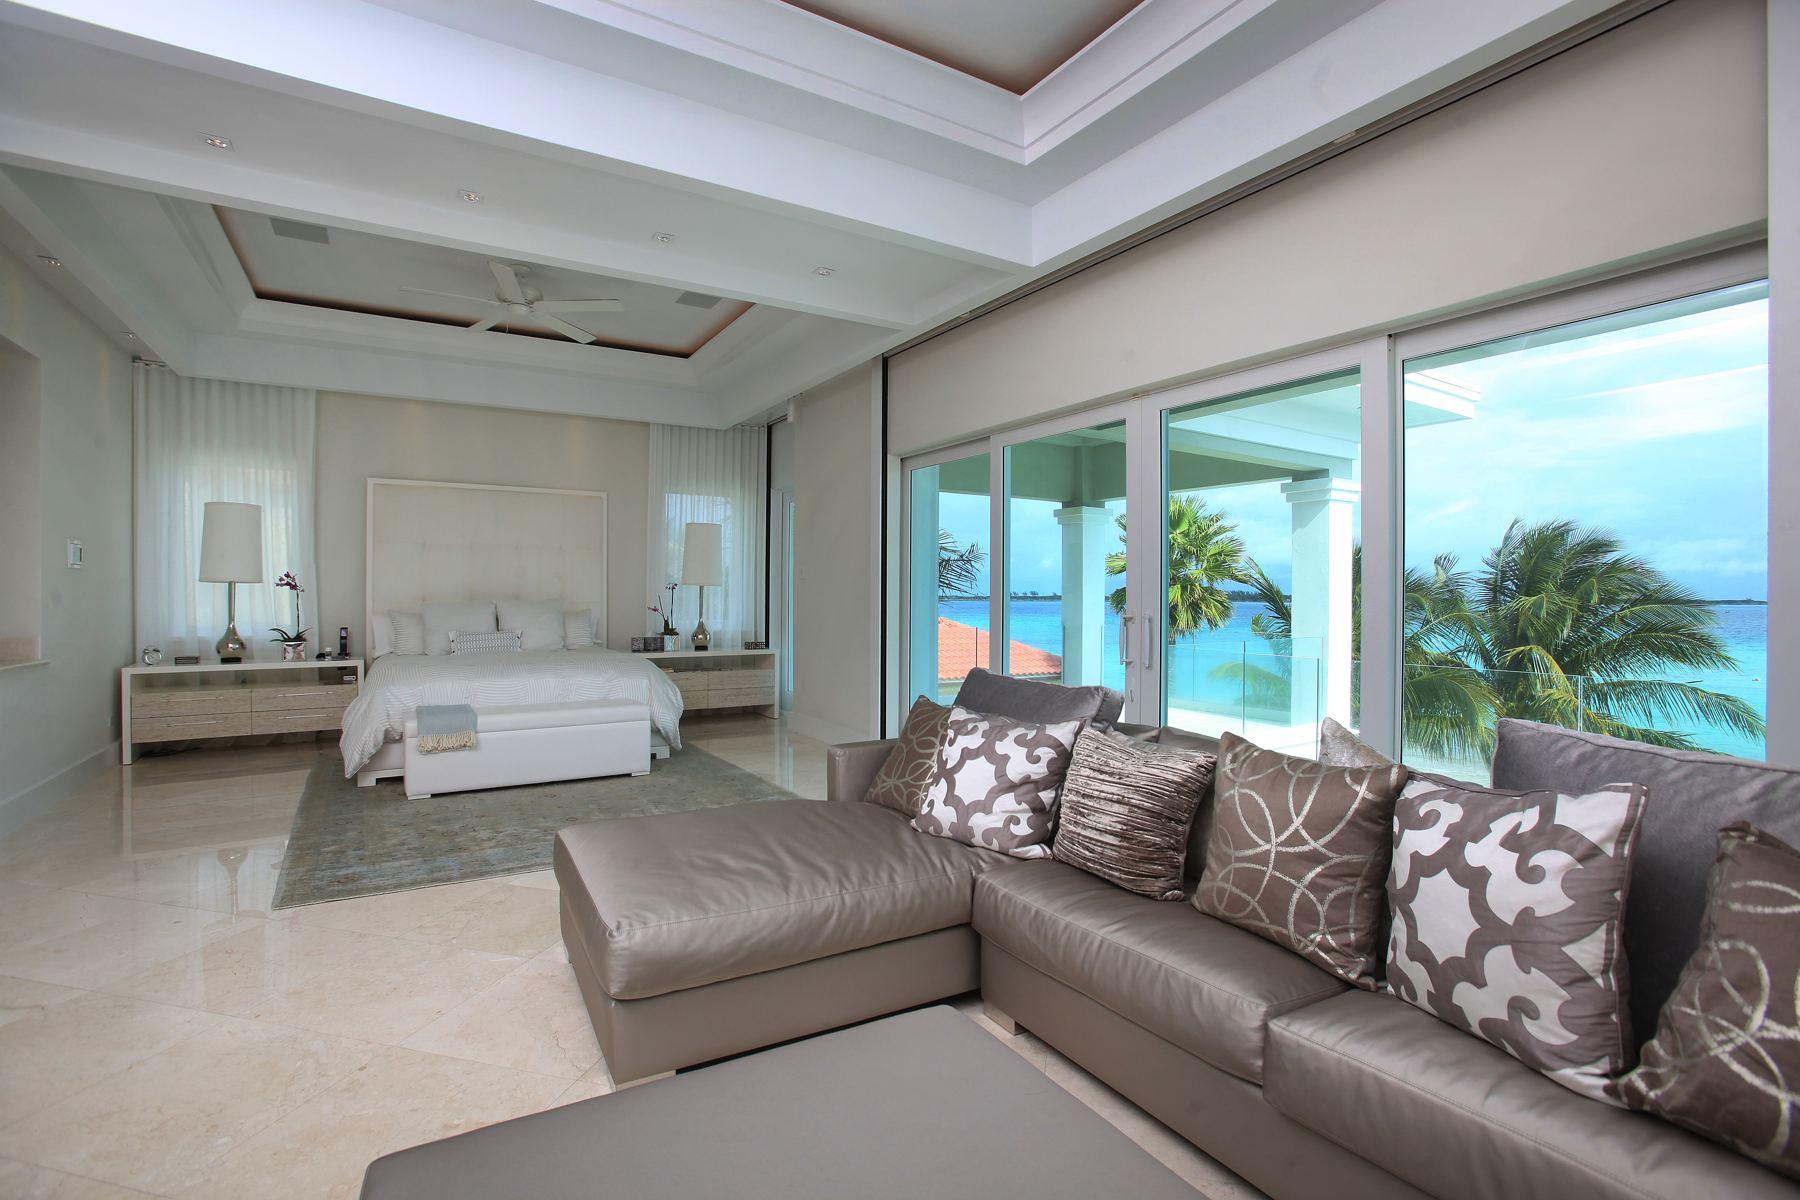 Additional photo for property listing at Ocean Club Estates #38 Ocean Club Estates, 天堂岛, 新普罗维登斯/拿骚 巴哈马